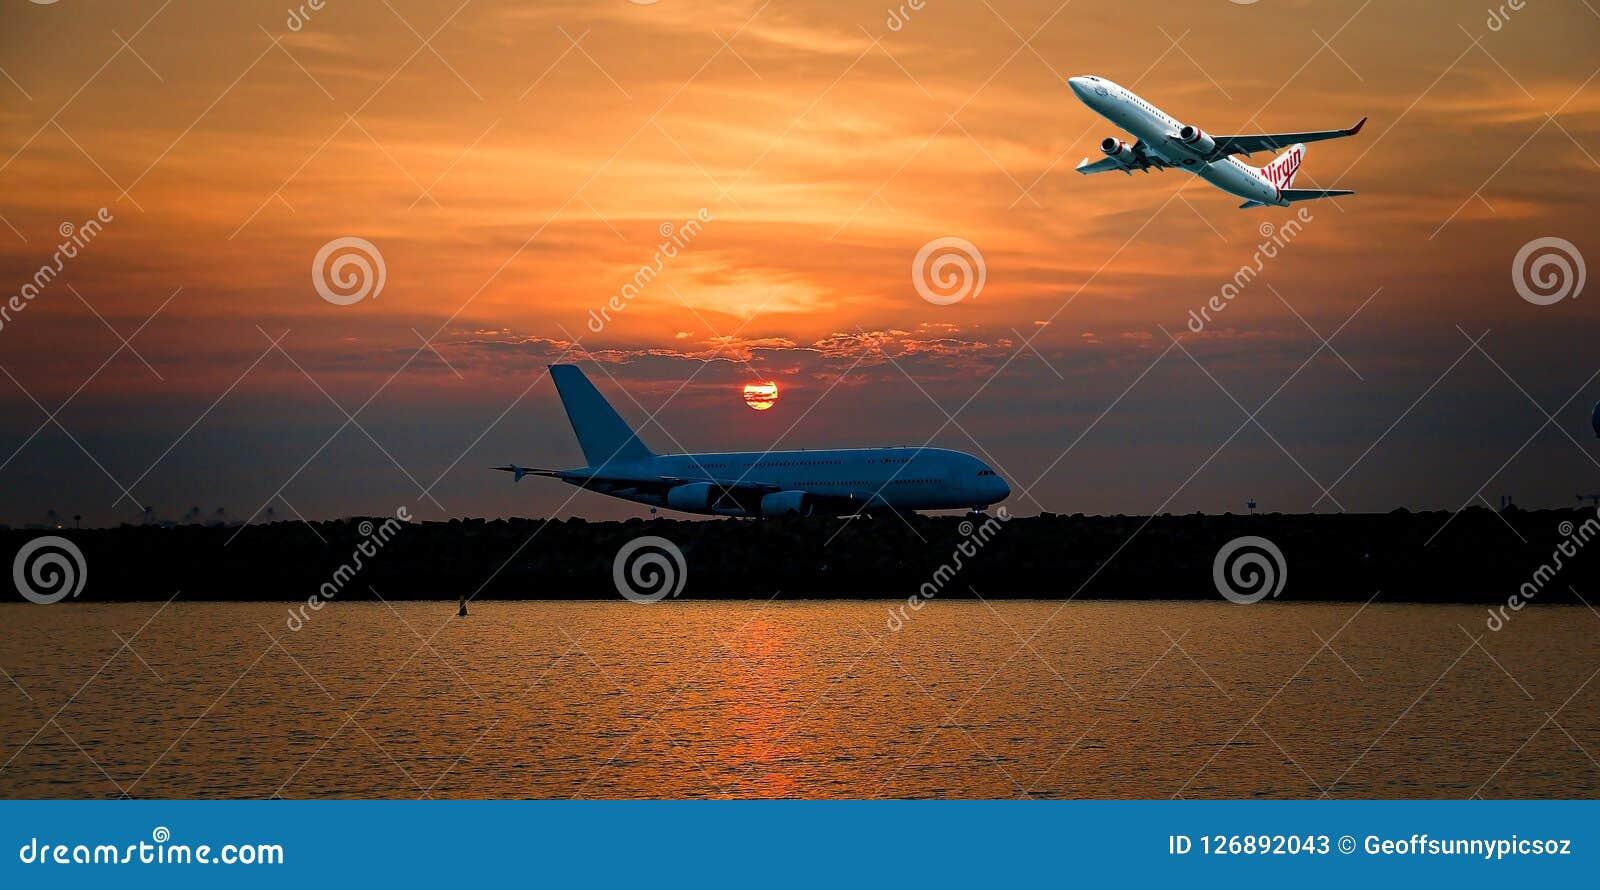 Aircraft in flight with cirrus cloud in orangge sky. Australia.